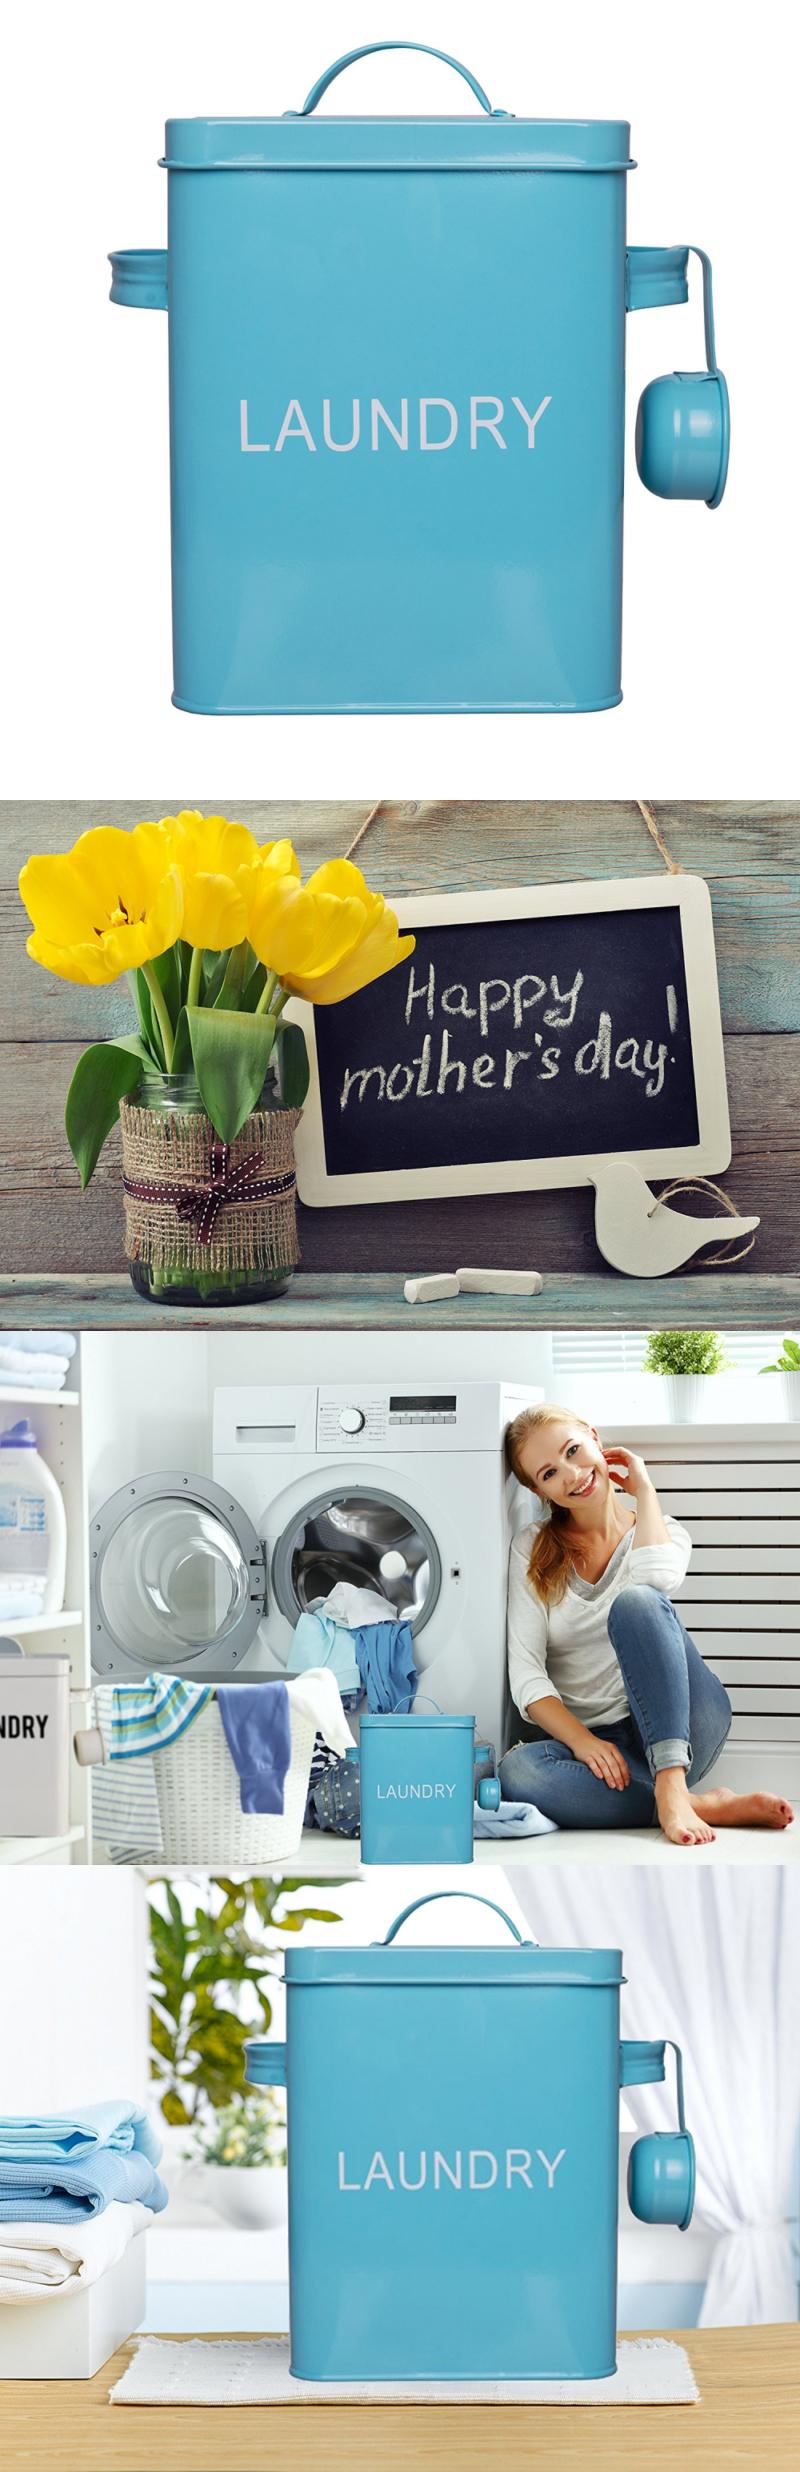 Detergents 78691: La Jolie Muse Laundry Detergent Storage Tin For Tide  Pods, Free Mesh